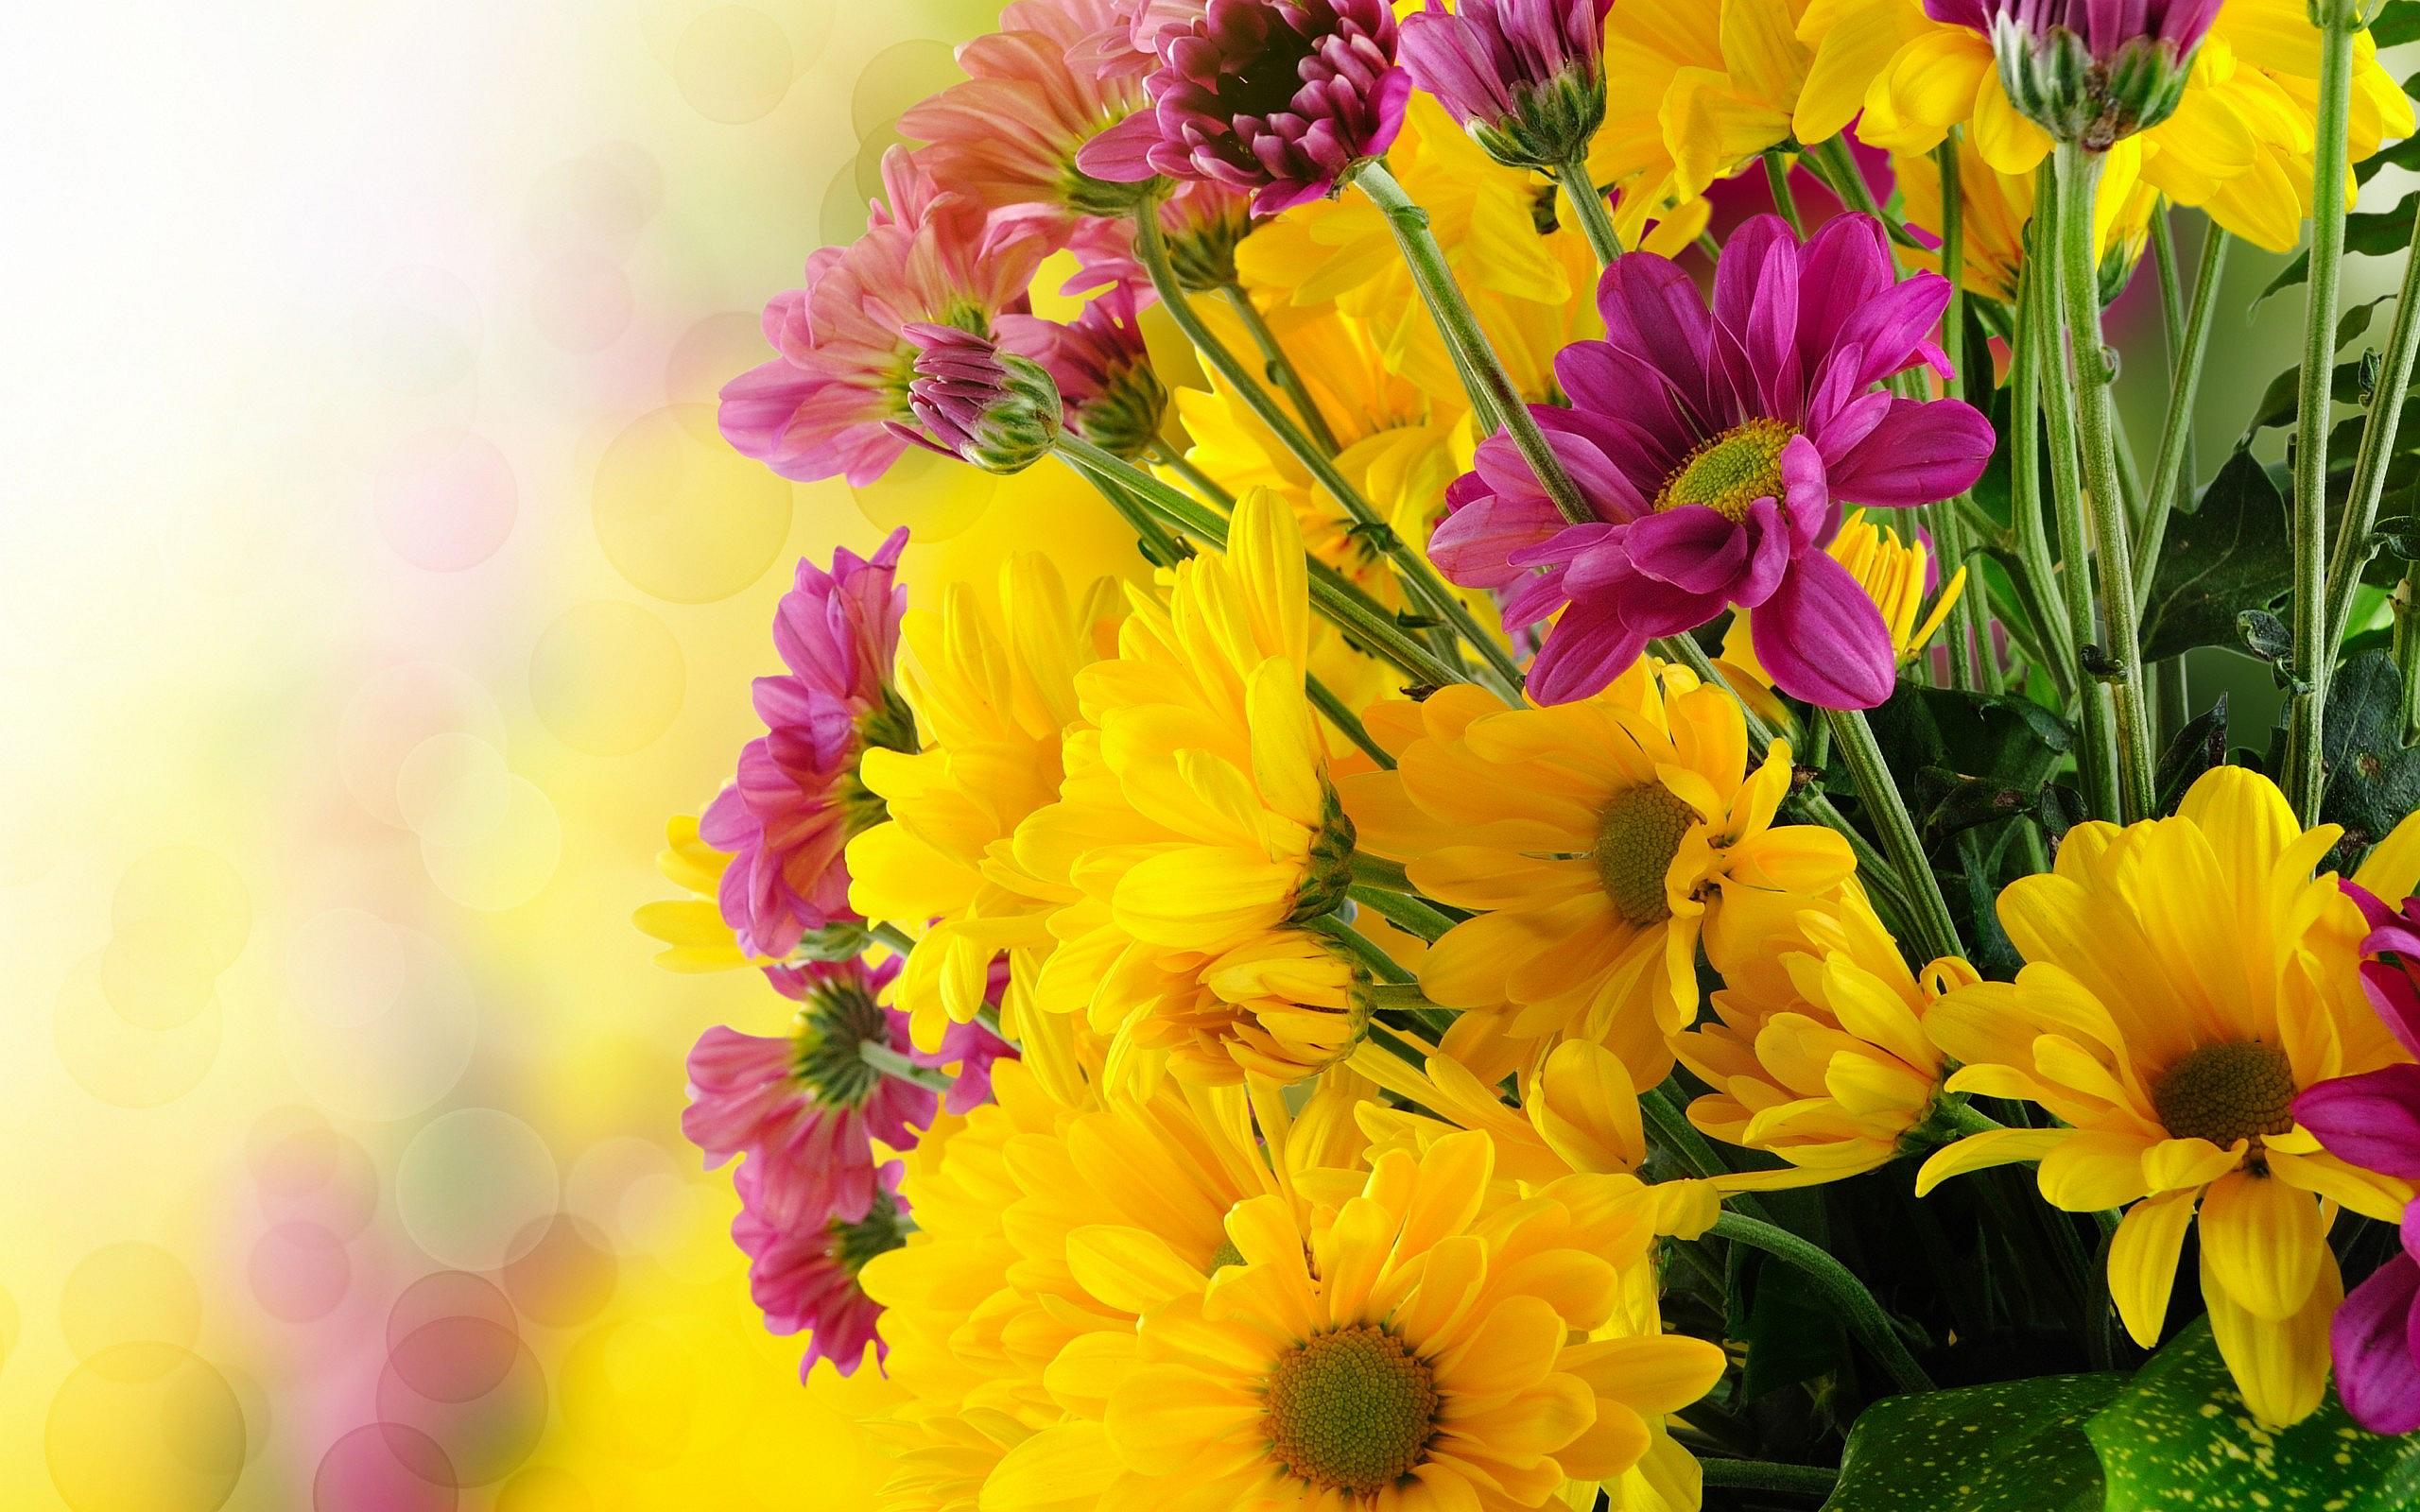 Yellow flowers 14143 2560x1600 px hdwallsource yellow flowers 14143 mightylinksfo Choice Image